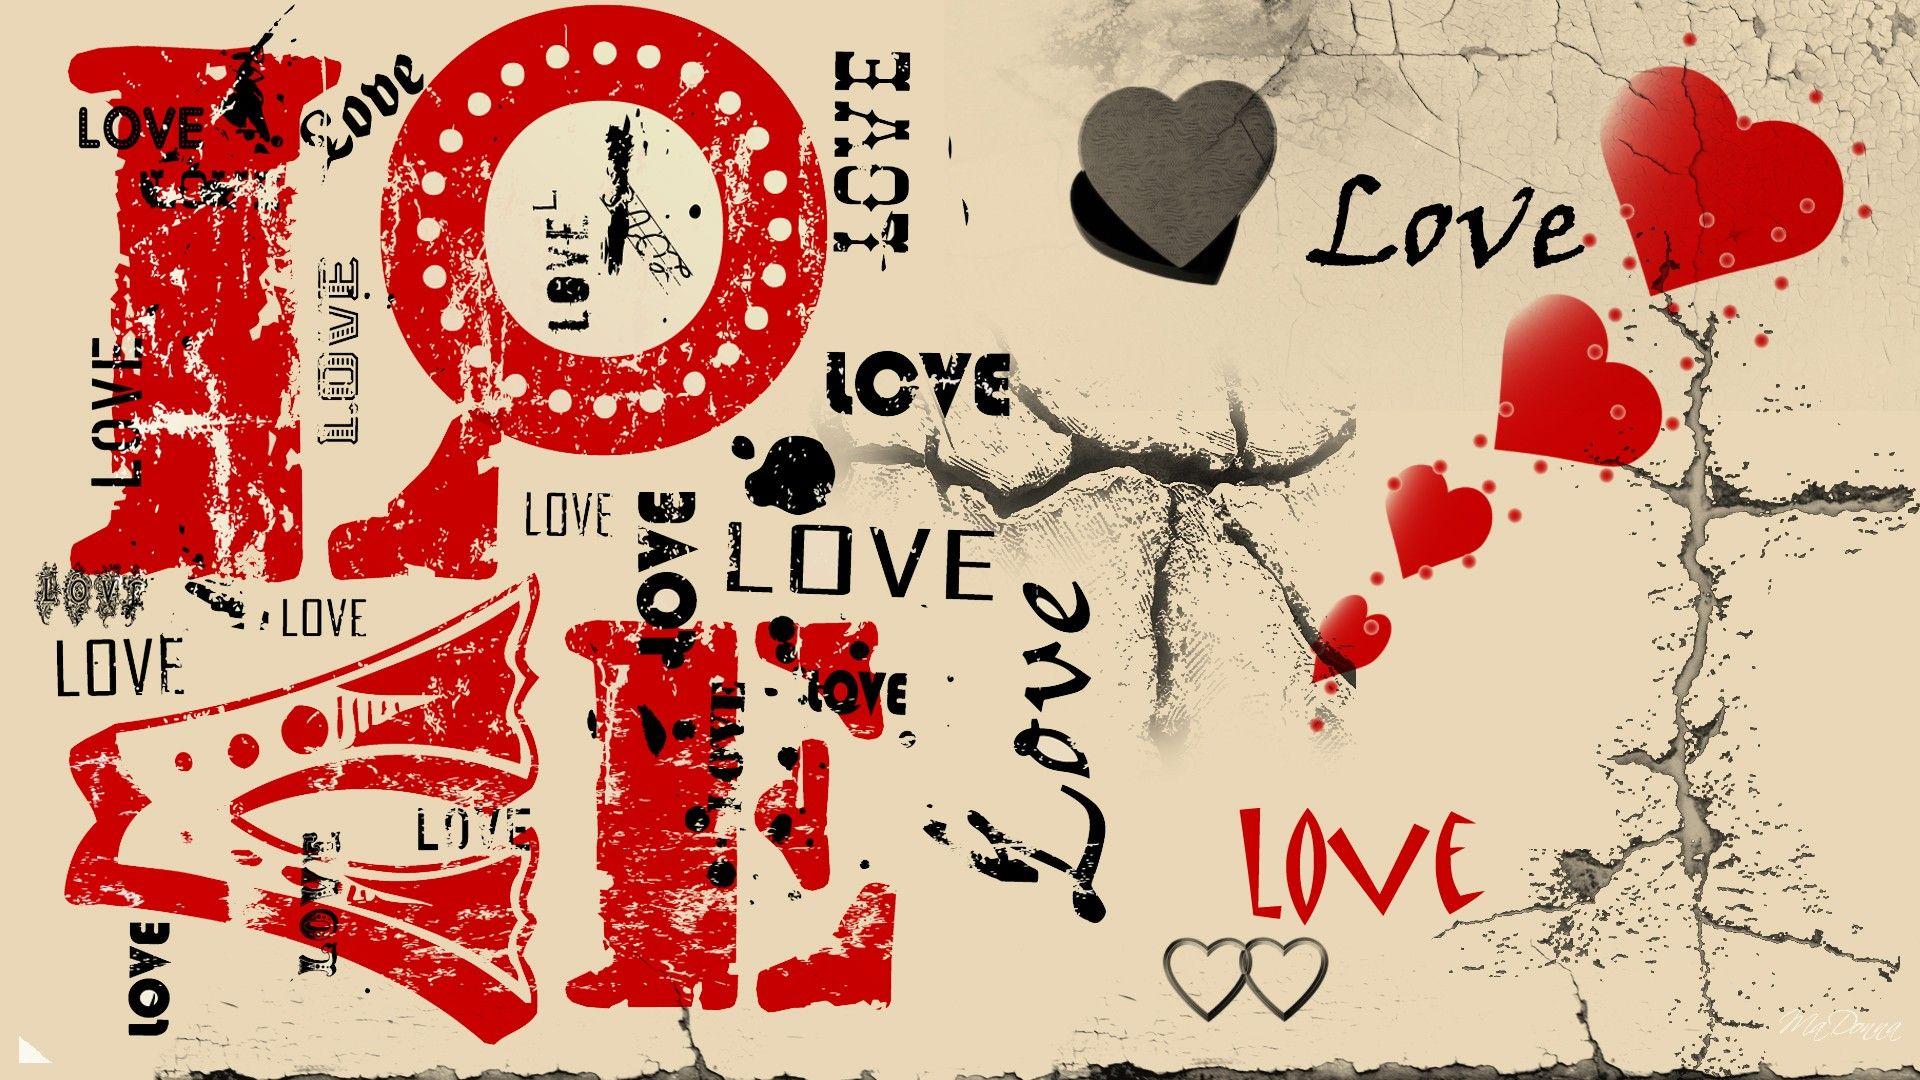 Vintage Valentine's Day Backgrounds   Love grunge cracked vintage valentines day HD Wallpaper